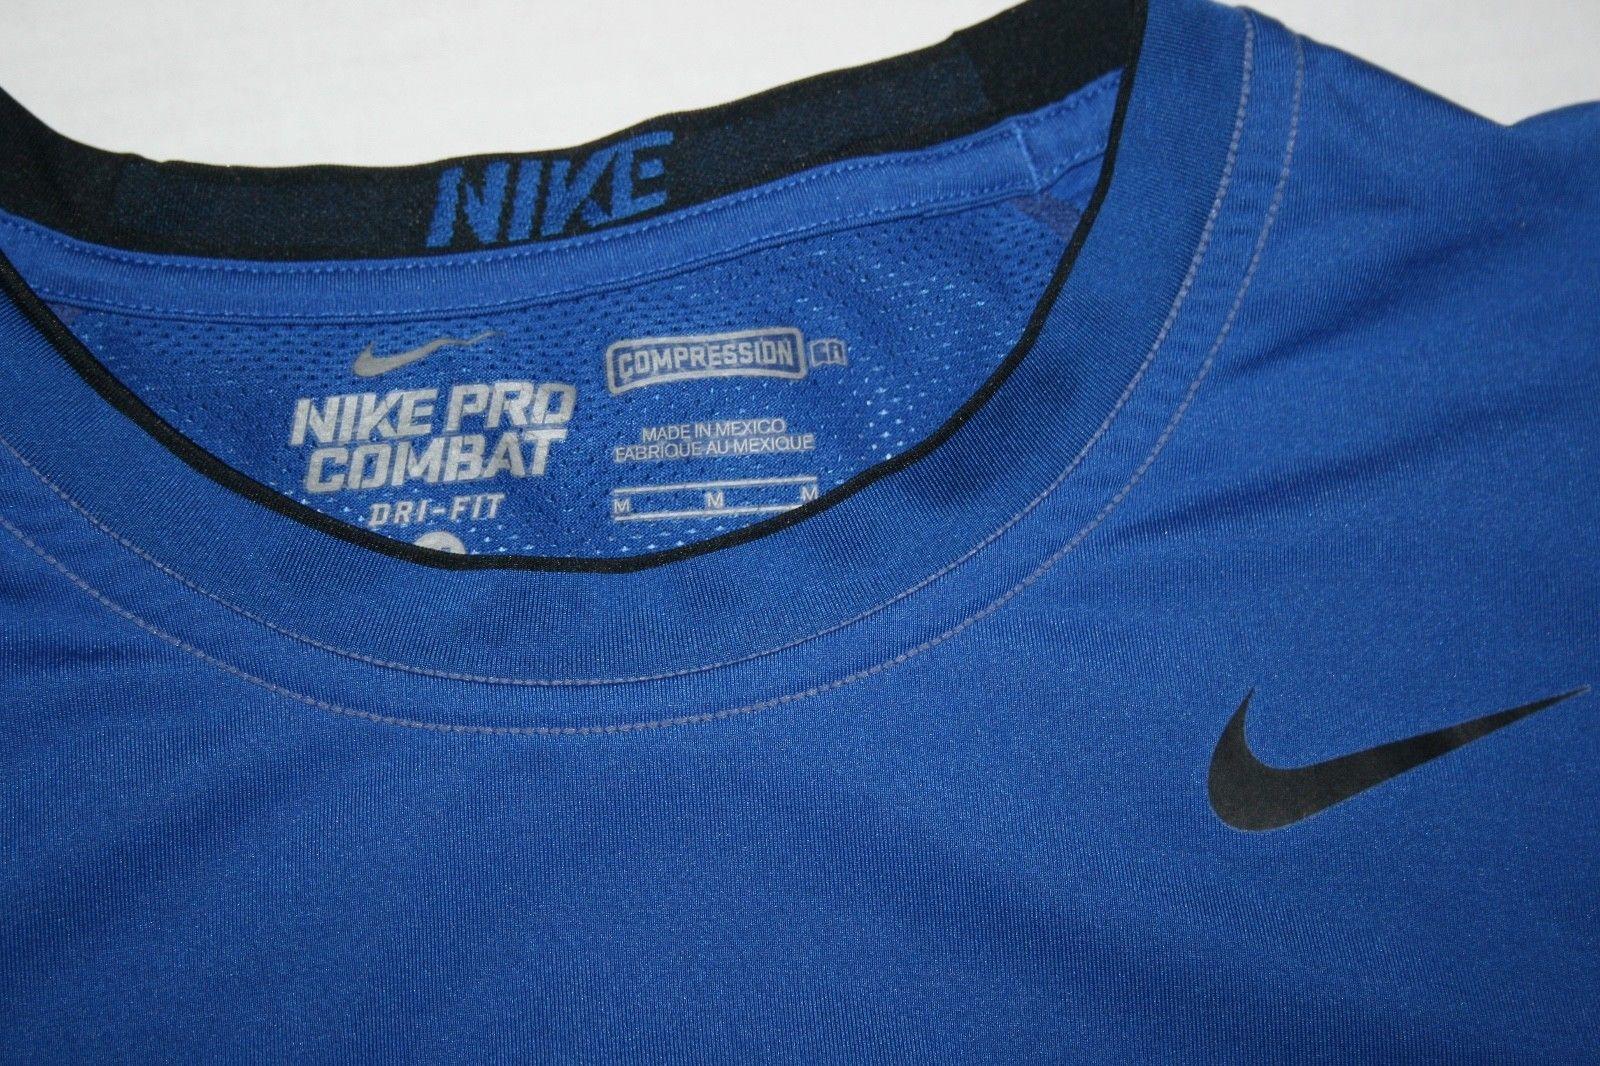 8ad05ea1 Nike Compression Shirts Youth | RLDM